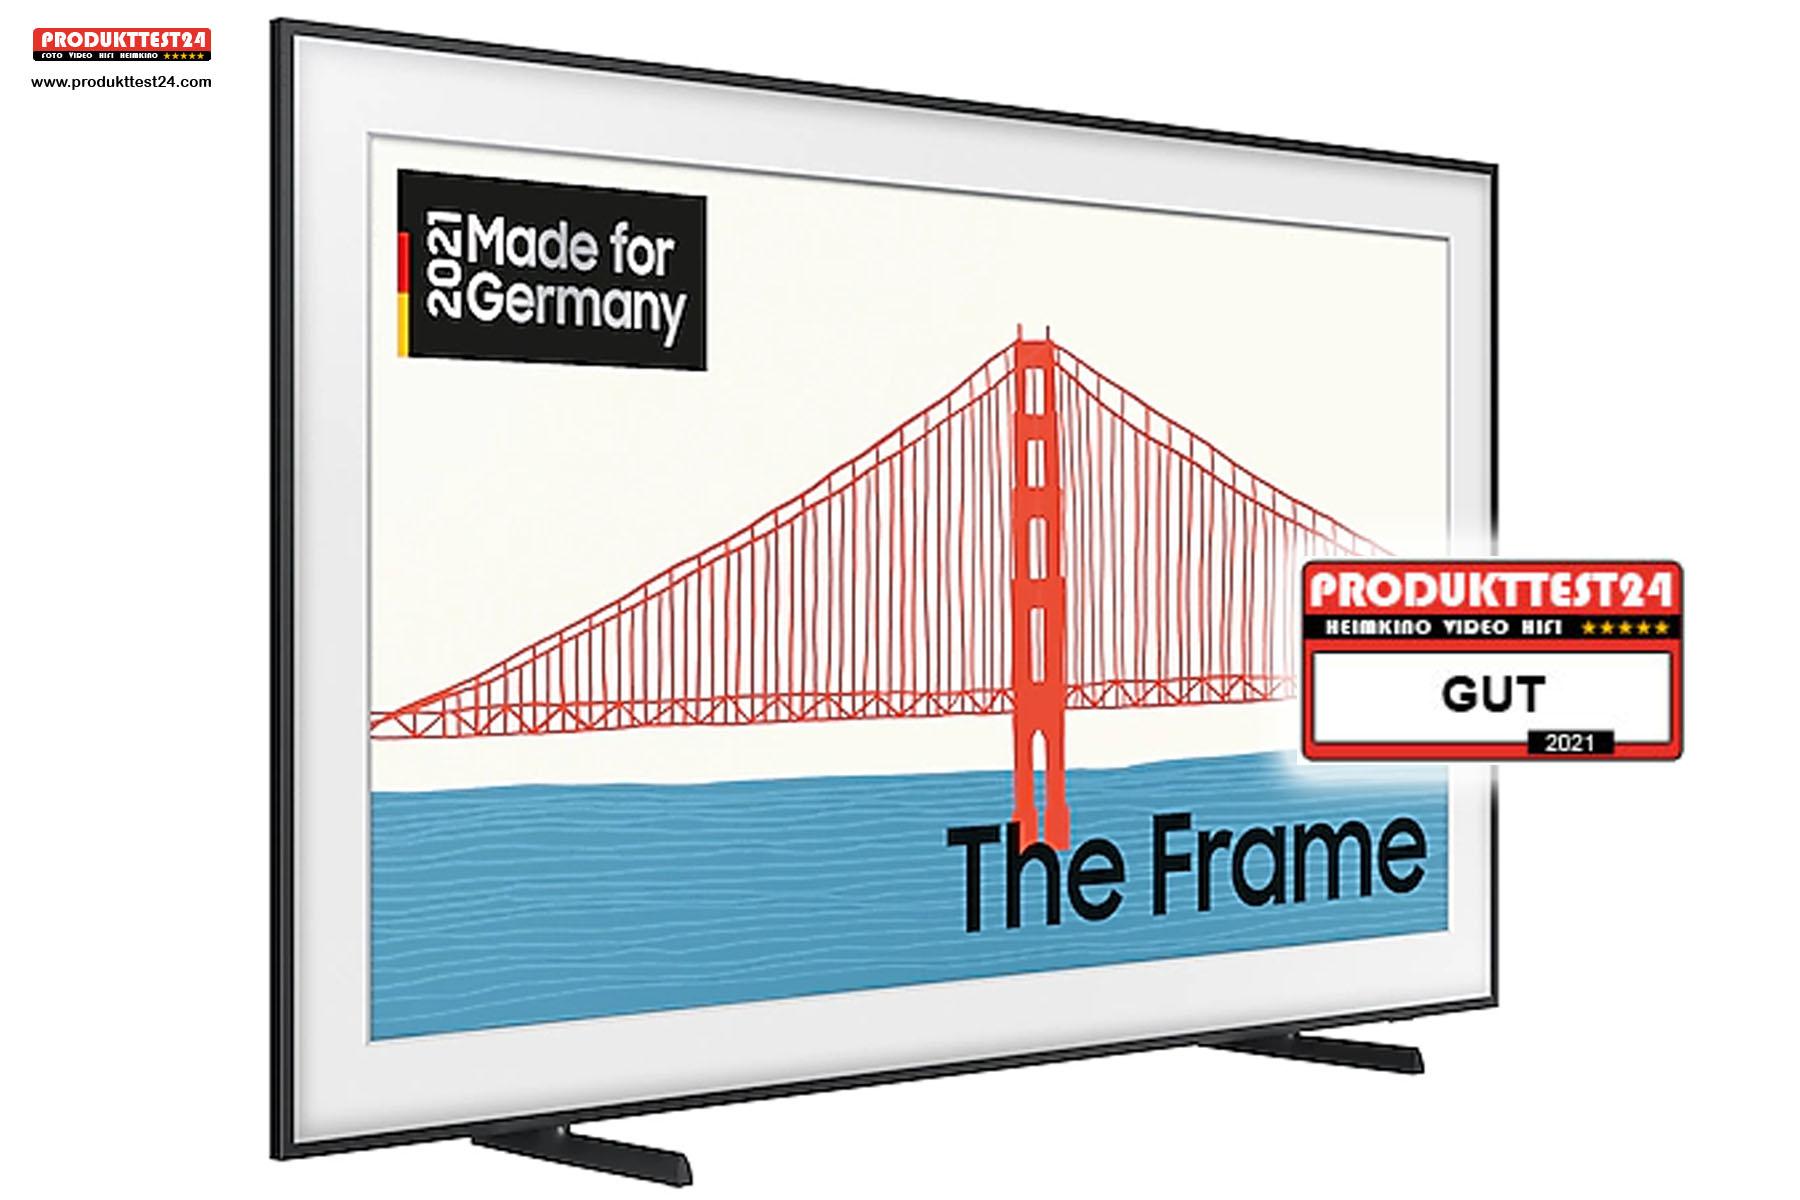 Samsung GQ43LS03AAUXZG - The Frame - Testurteil: GUT!